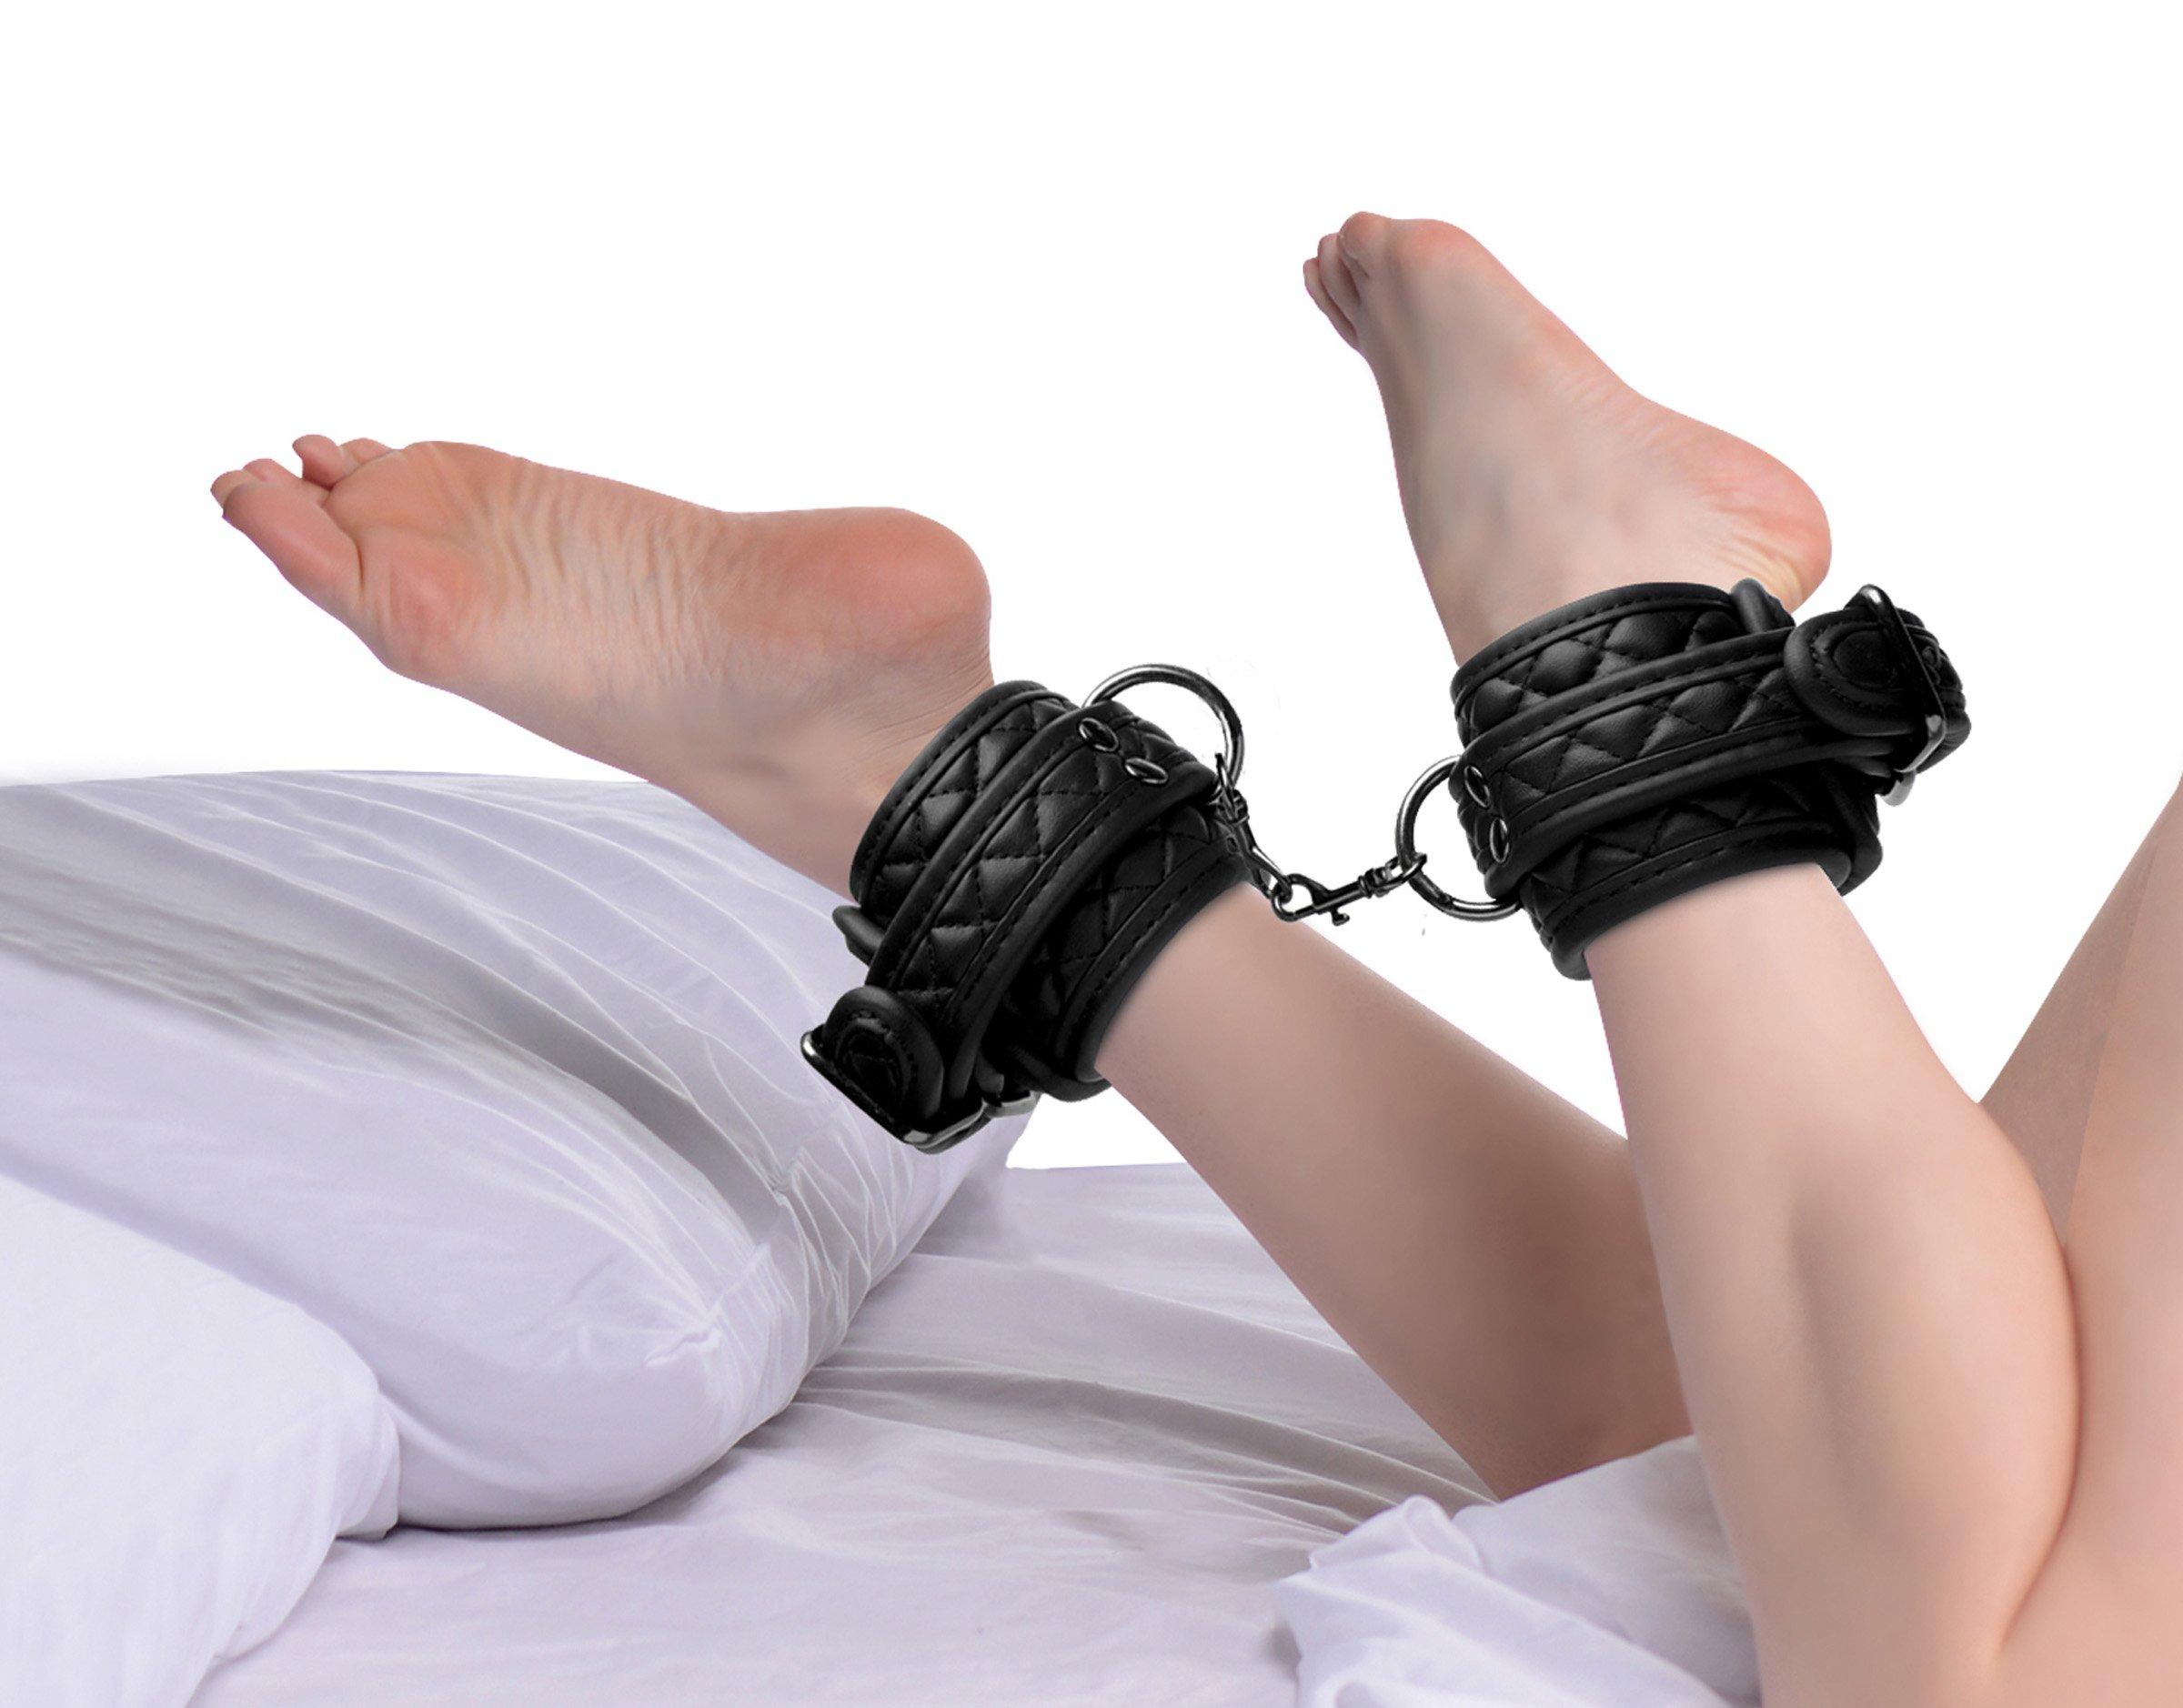 Concede Wrist and Ankle Restraint Set With Bonus Hog-Tie Adaptor